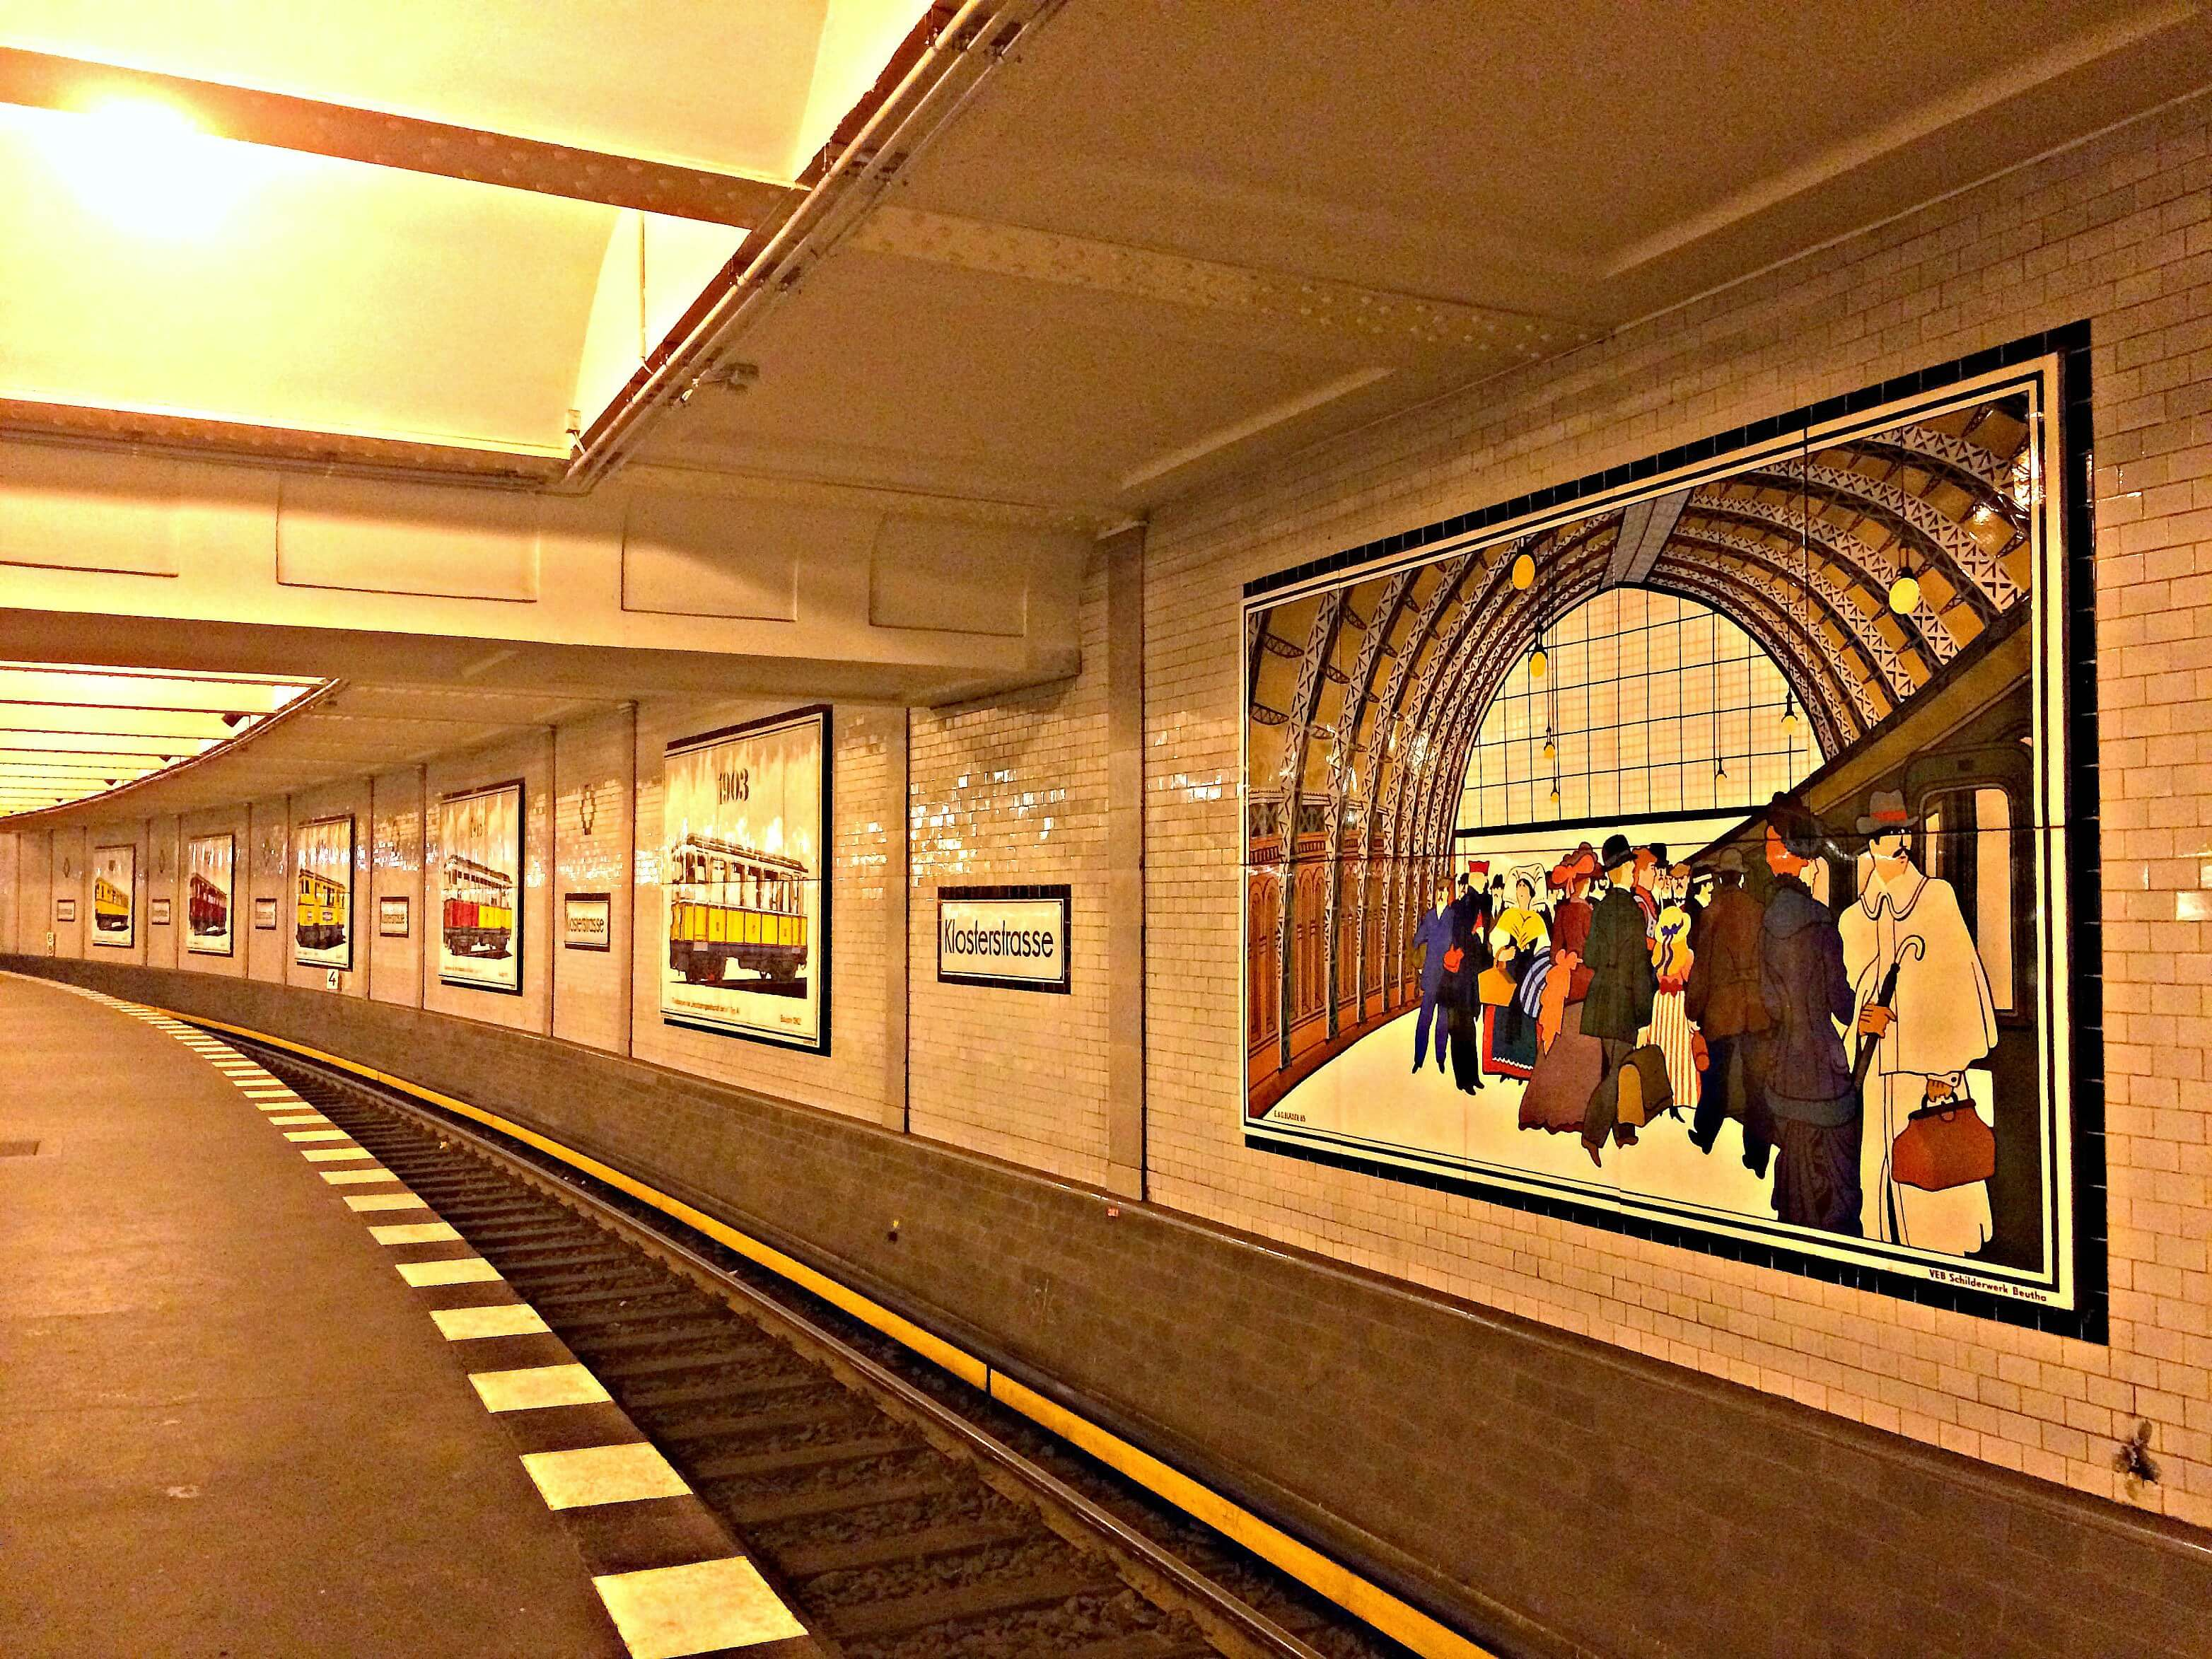 Metrostation Klosterstraße